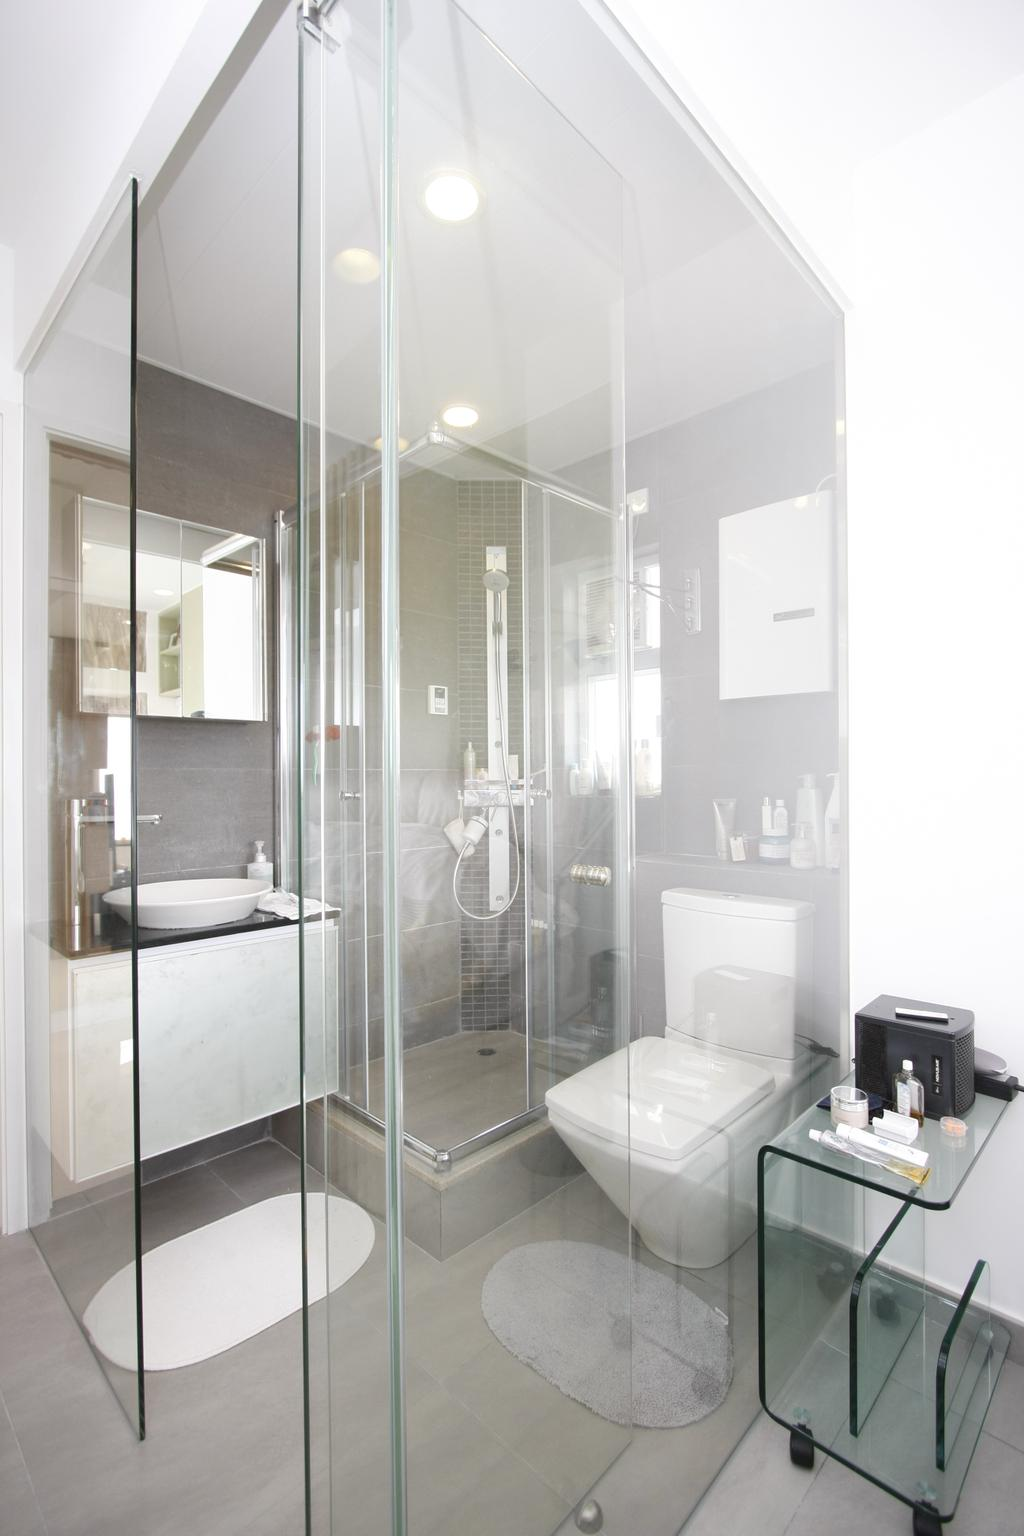 摩登, 私家樓, 浴室, 黃金海岸, 室內設計師, 和生設計, Indoors, Interior Design, Room